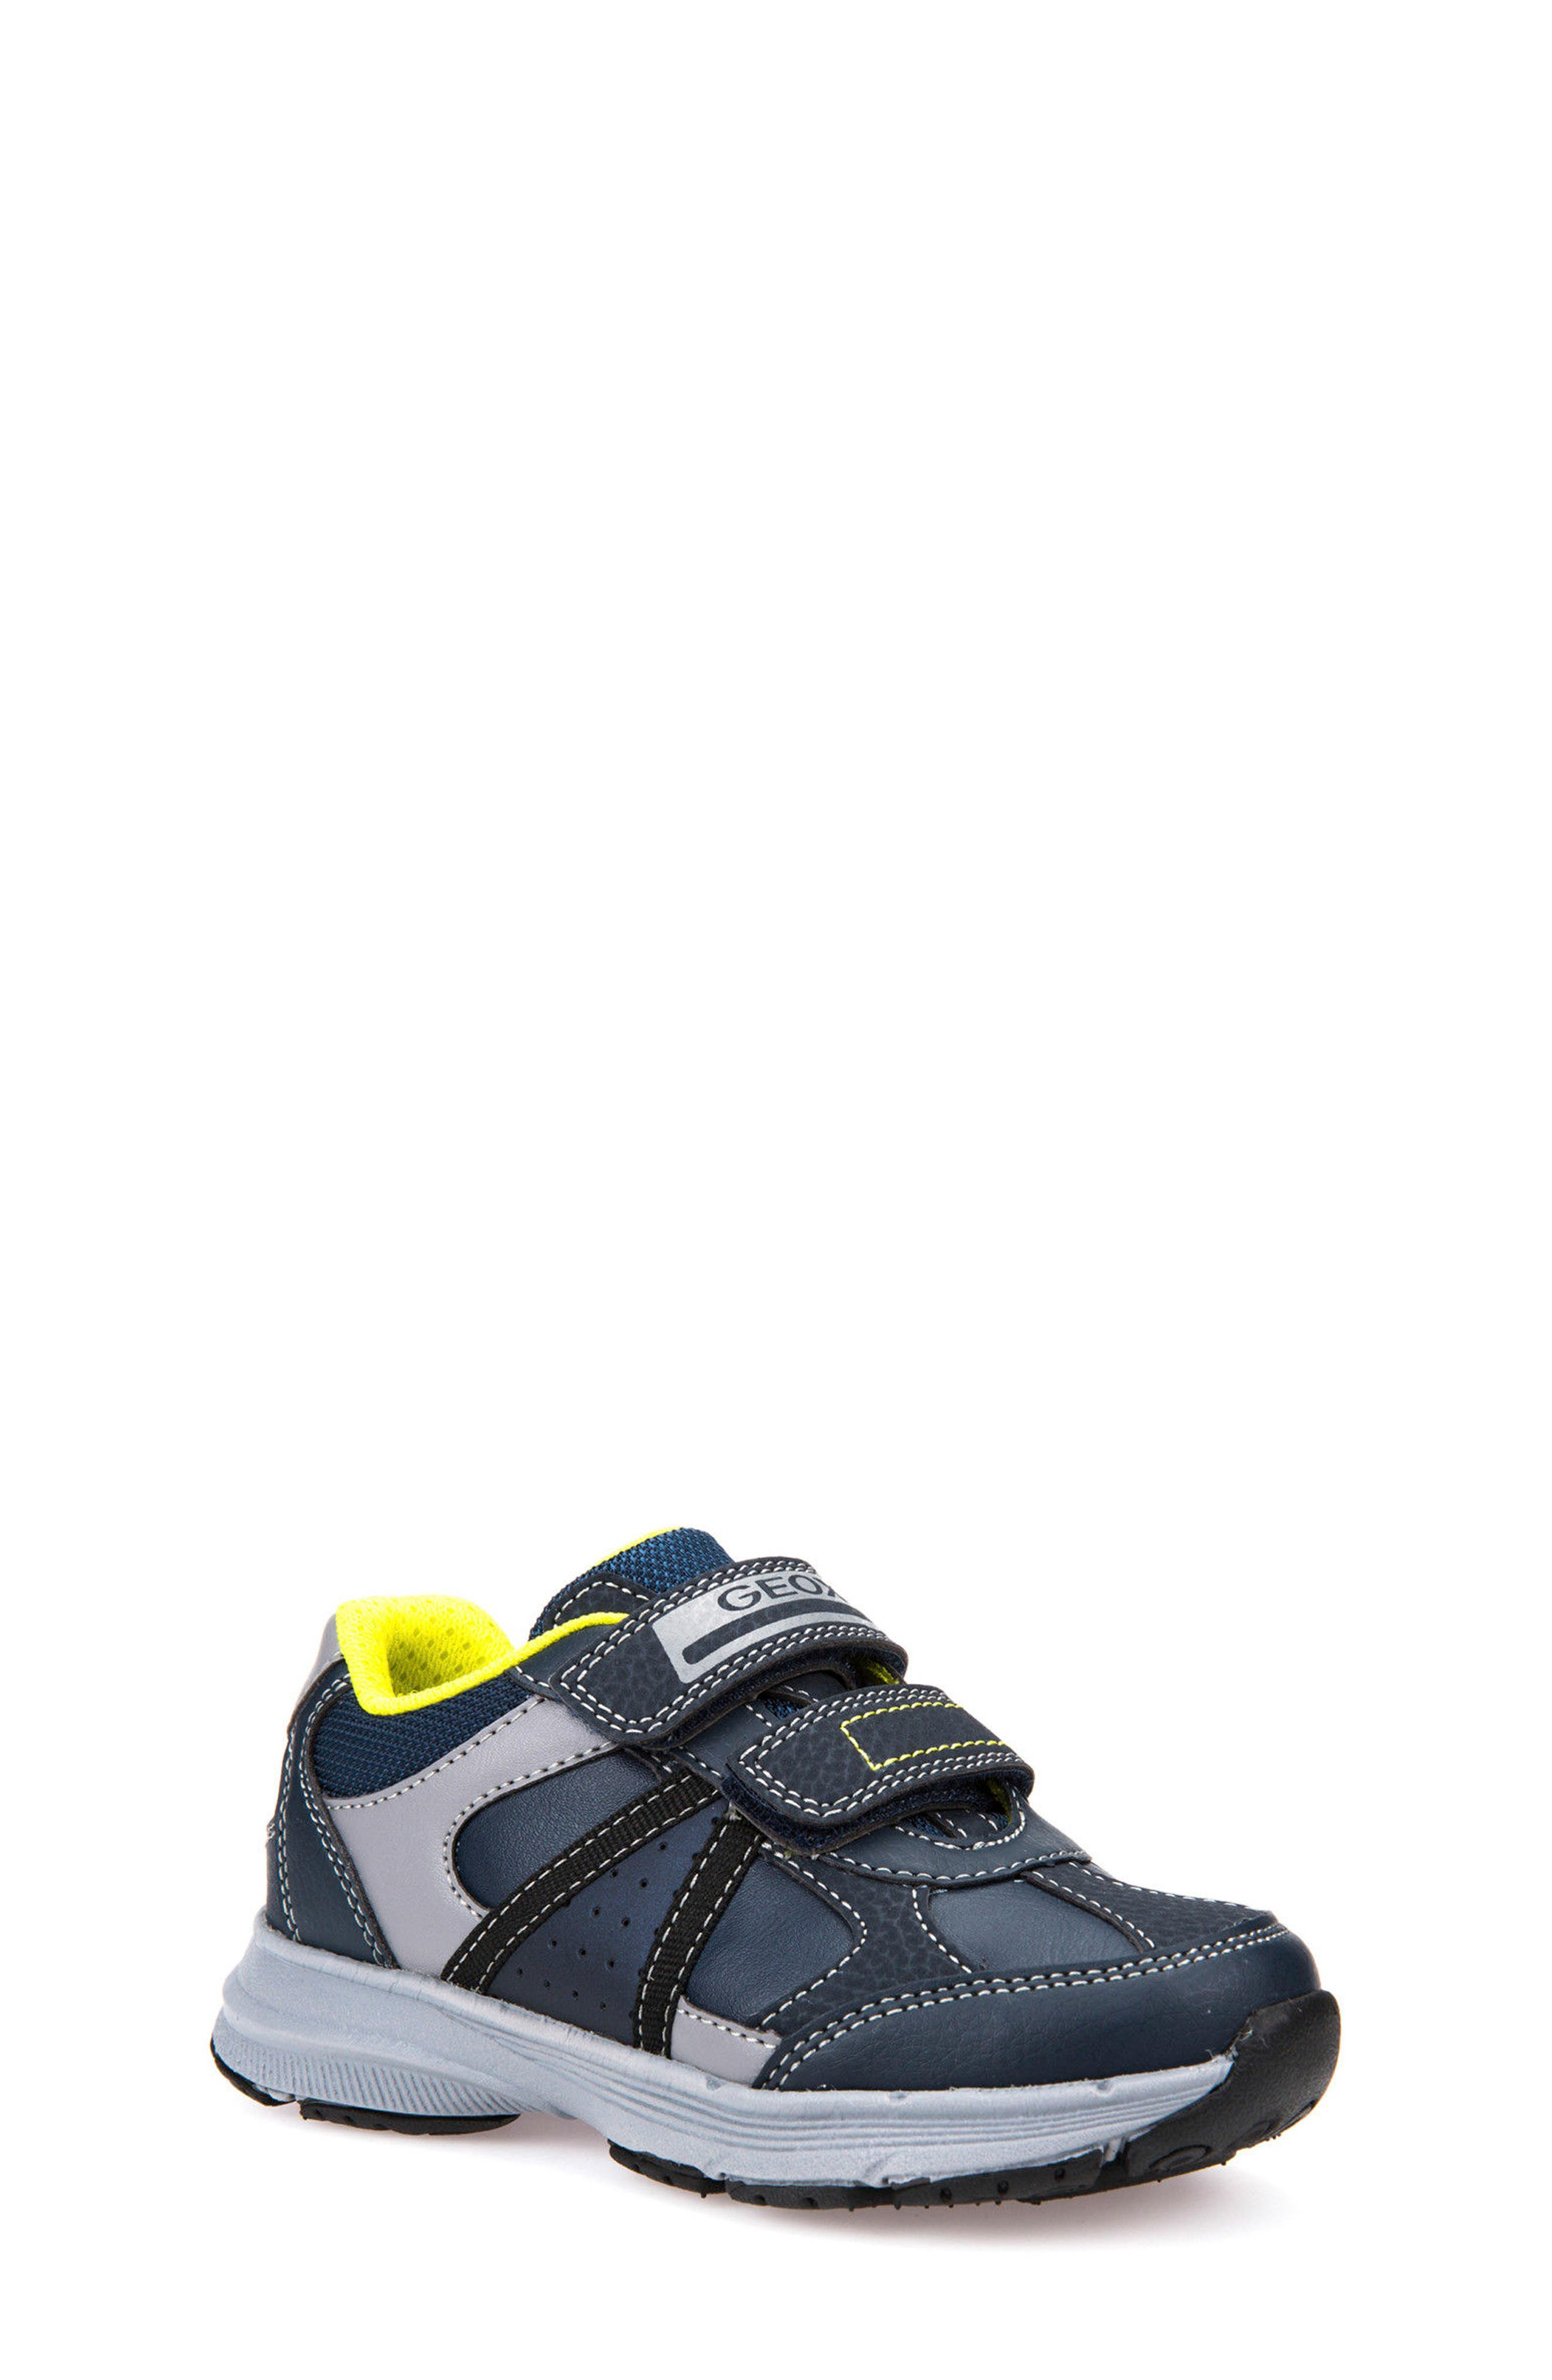 Top Fly Sneaker,                             Main thumbnail 1, color,                             Navy